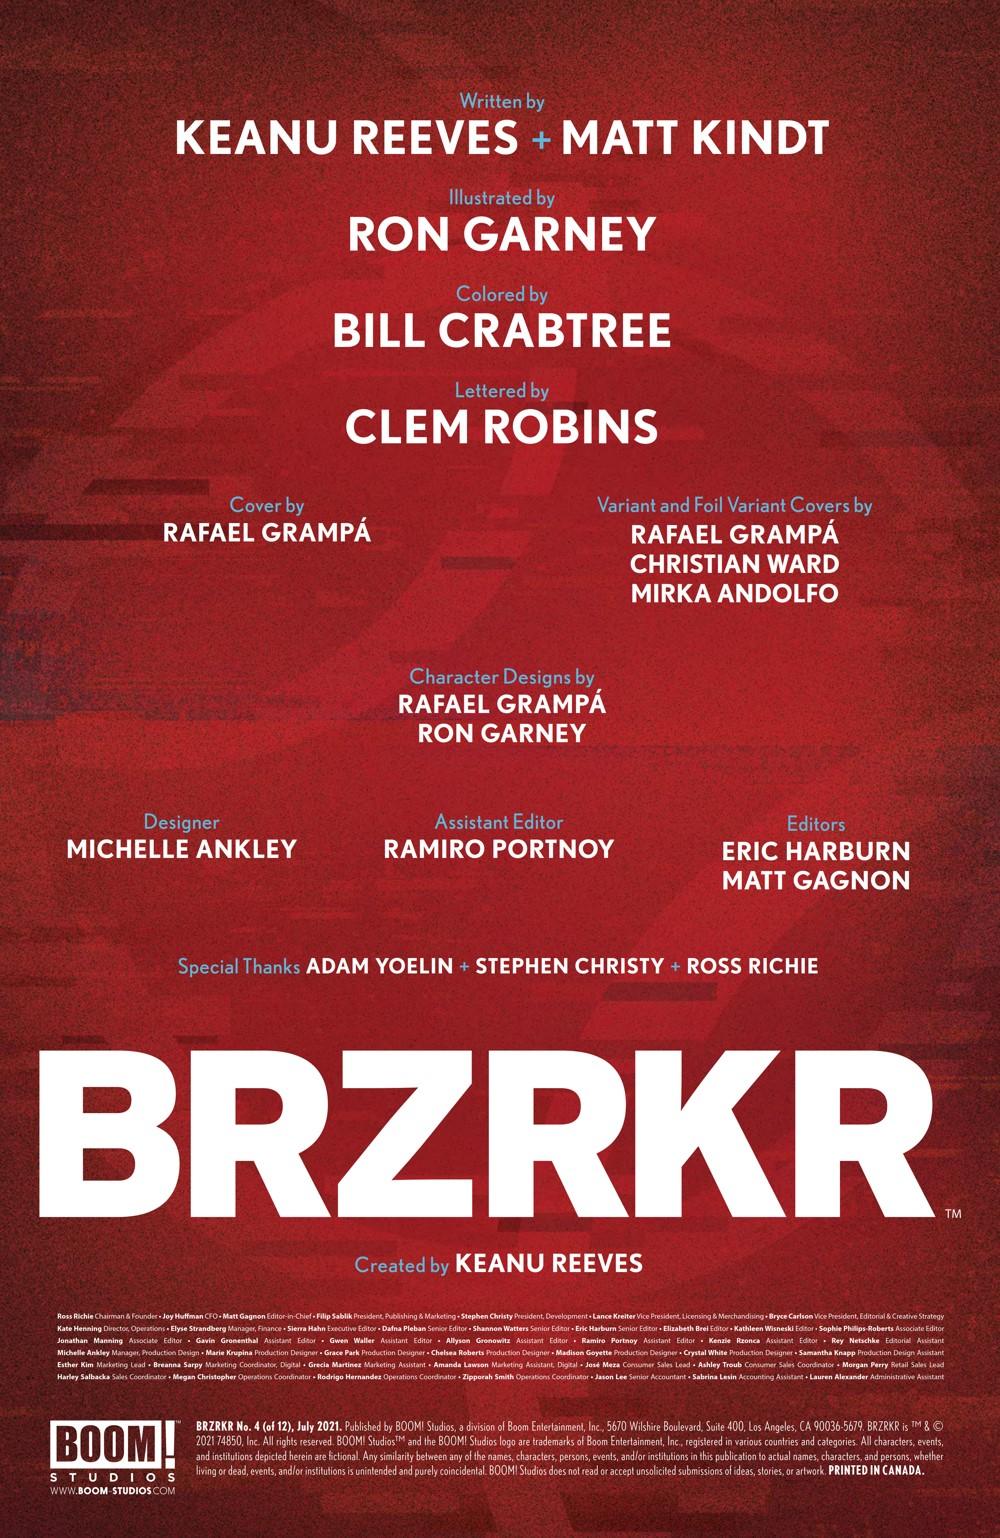 BRZRKR_004_PRESS_2 ComicList Previews: BRZRKR #4 (OF 12)